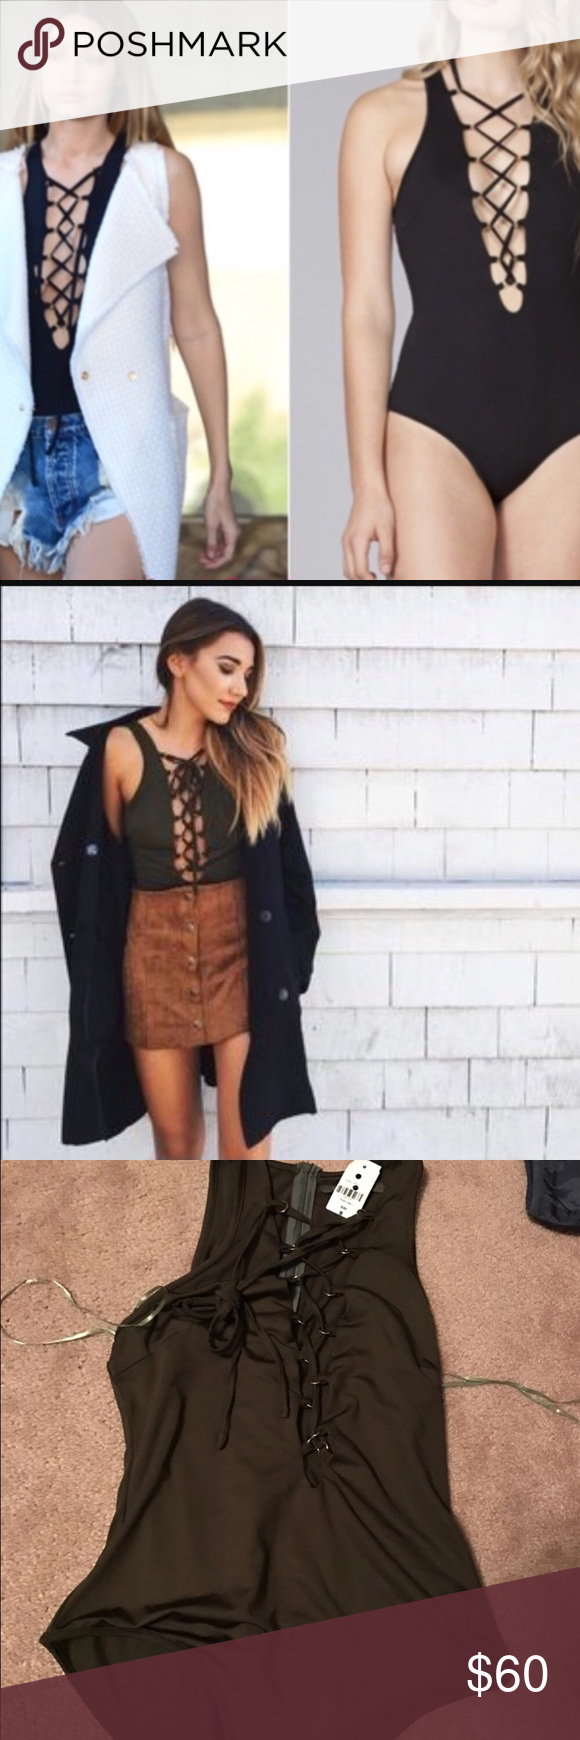 Rust lace bodysuit  NWT LF lace up bodysuit NWT LF olive green lace up bodysuit never